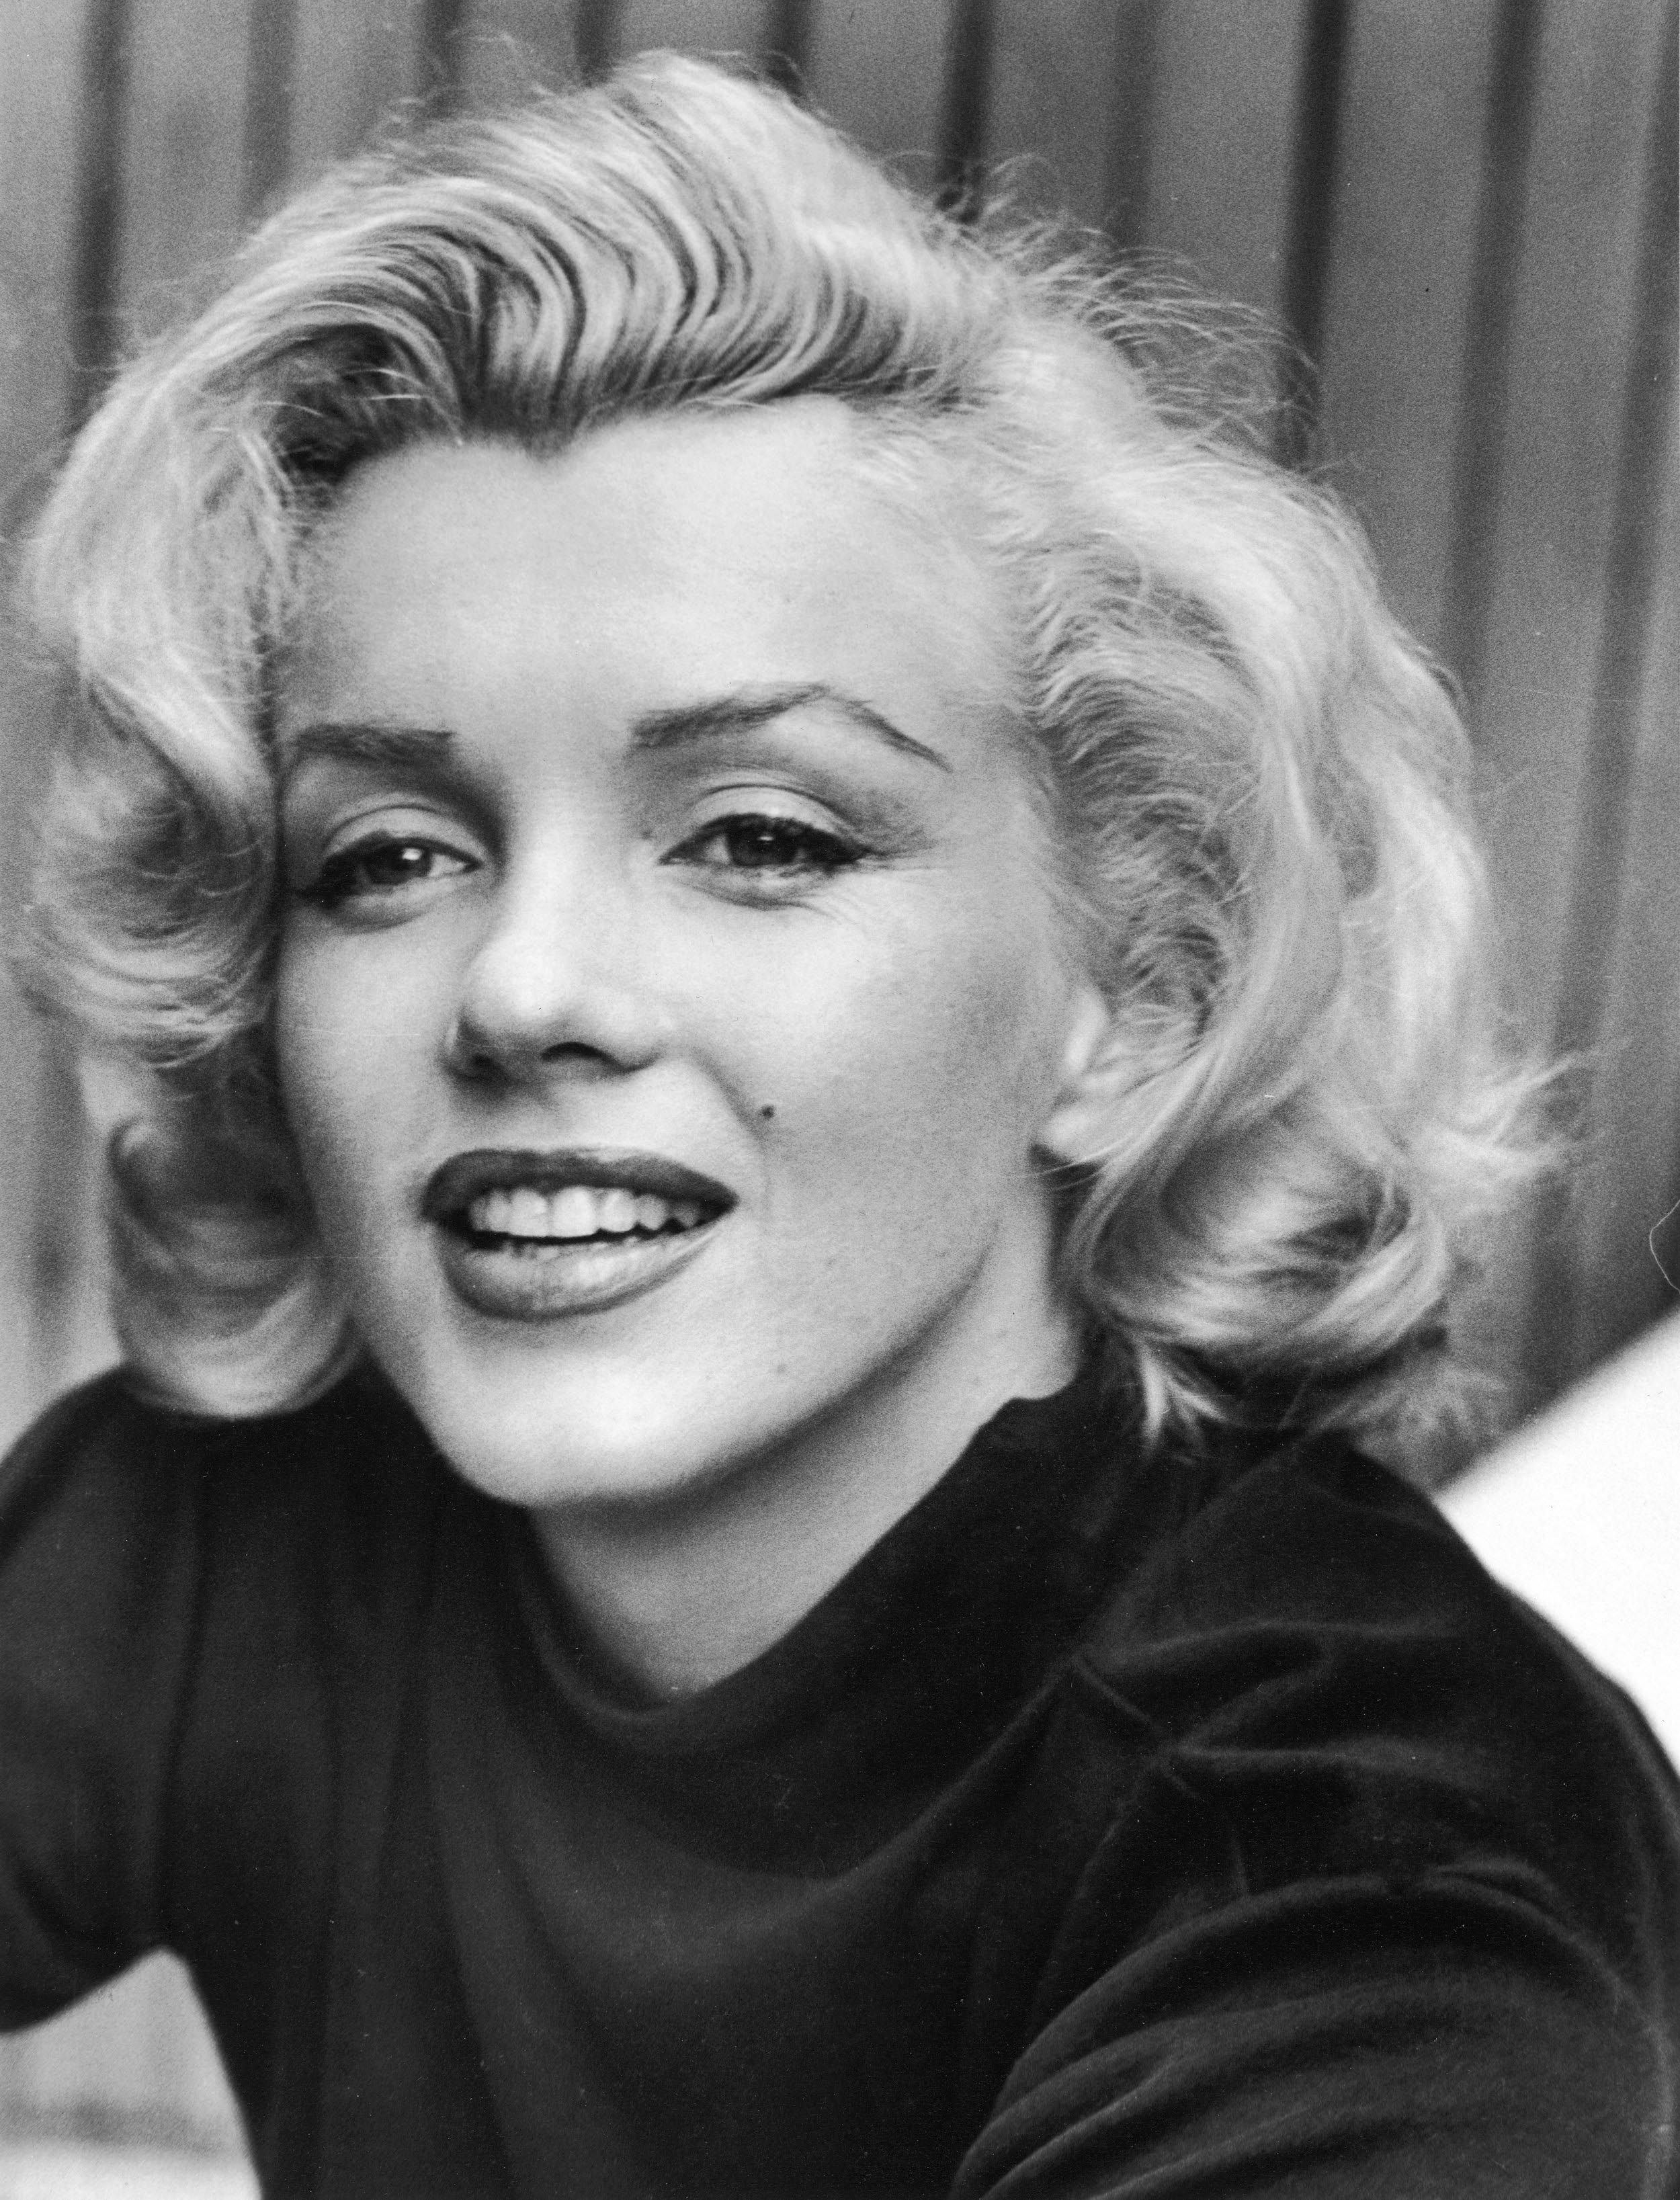 Marilyn Monroe 1953 Marilyn Monroe Portrait Marilyn Monroe Photos Marilyn Monroe Hair